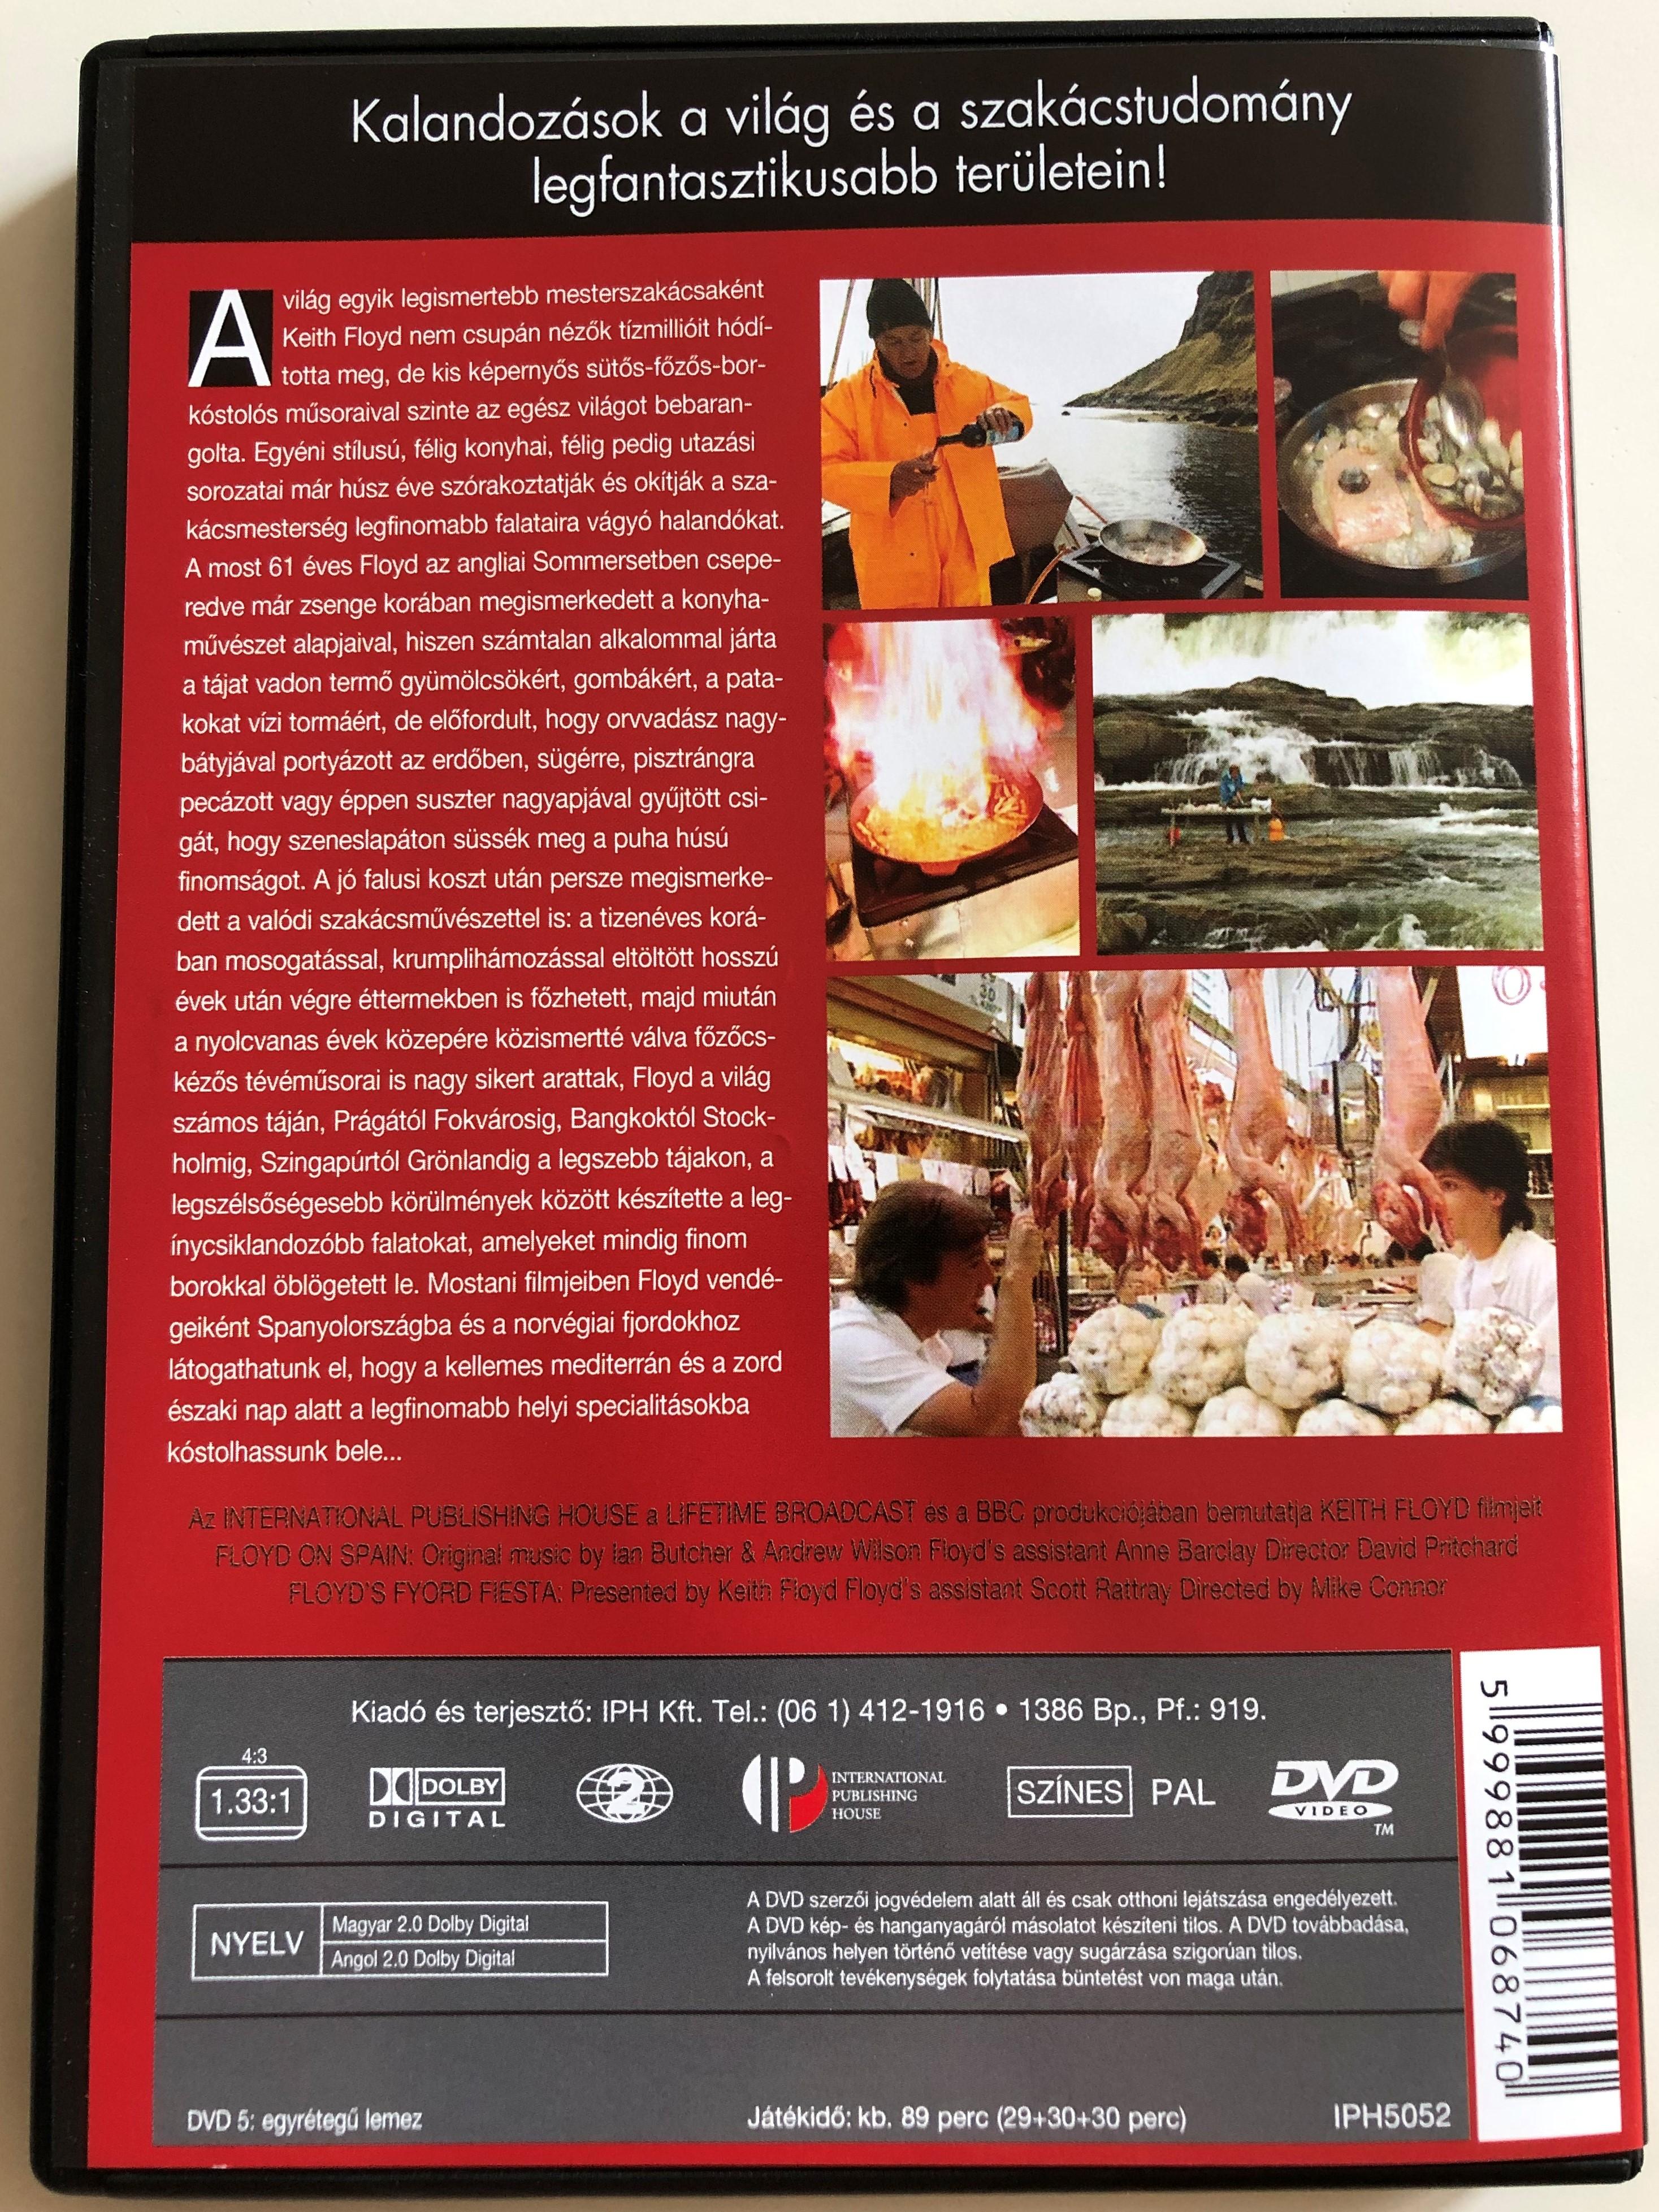 3-gastronomical-film-adventures-dvd-floyd-on-spain-galicia-basque-country-floyds-fjord-fiesta-gasztron-miai-kalandoz-sok-floyddal-az-vsz-zad-szak-csa-hungarian-dub-2-.jpg